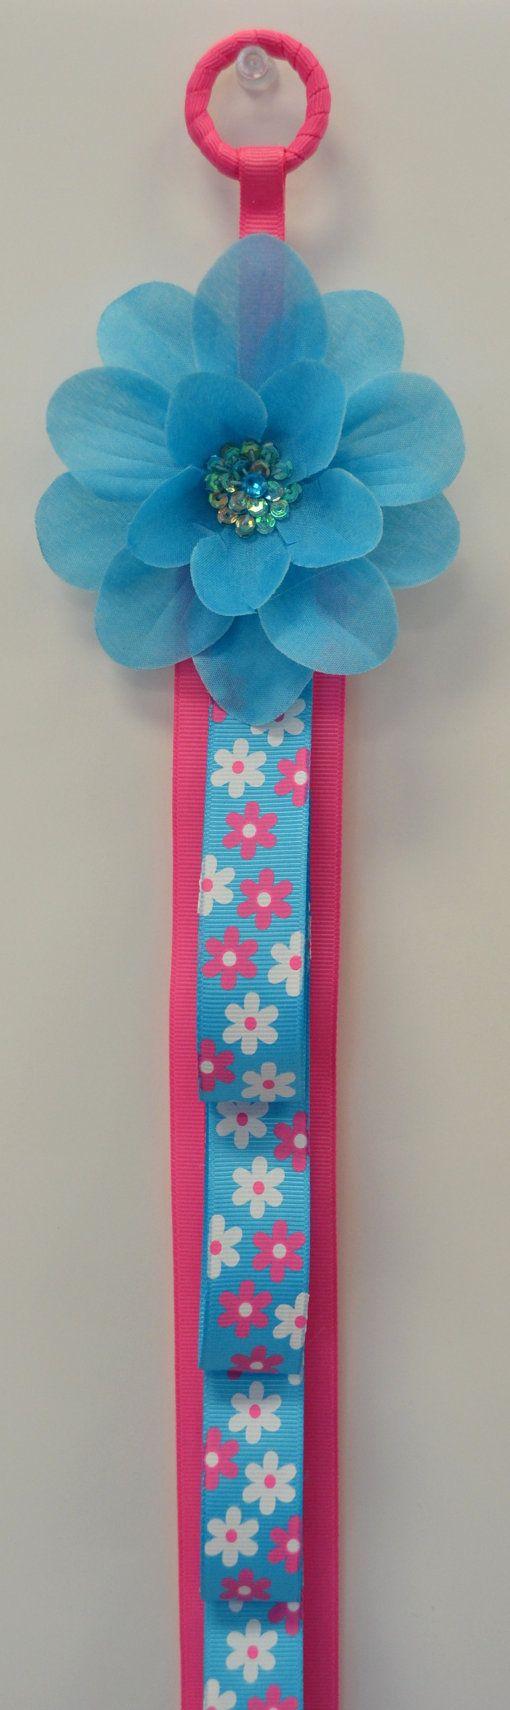 Funky Flower Ribbon Headband Holder by Funnygirldesigns on Etsy, $22.00